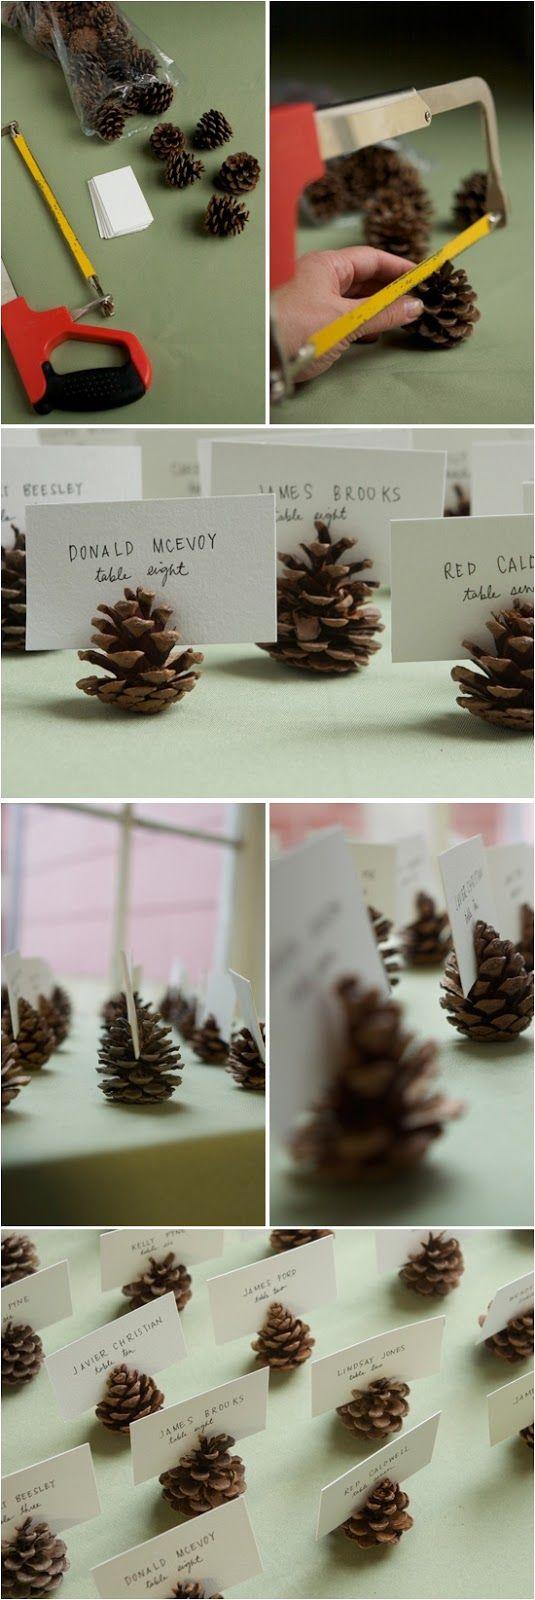 ideias decoracao casamento ecologico 5